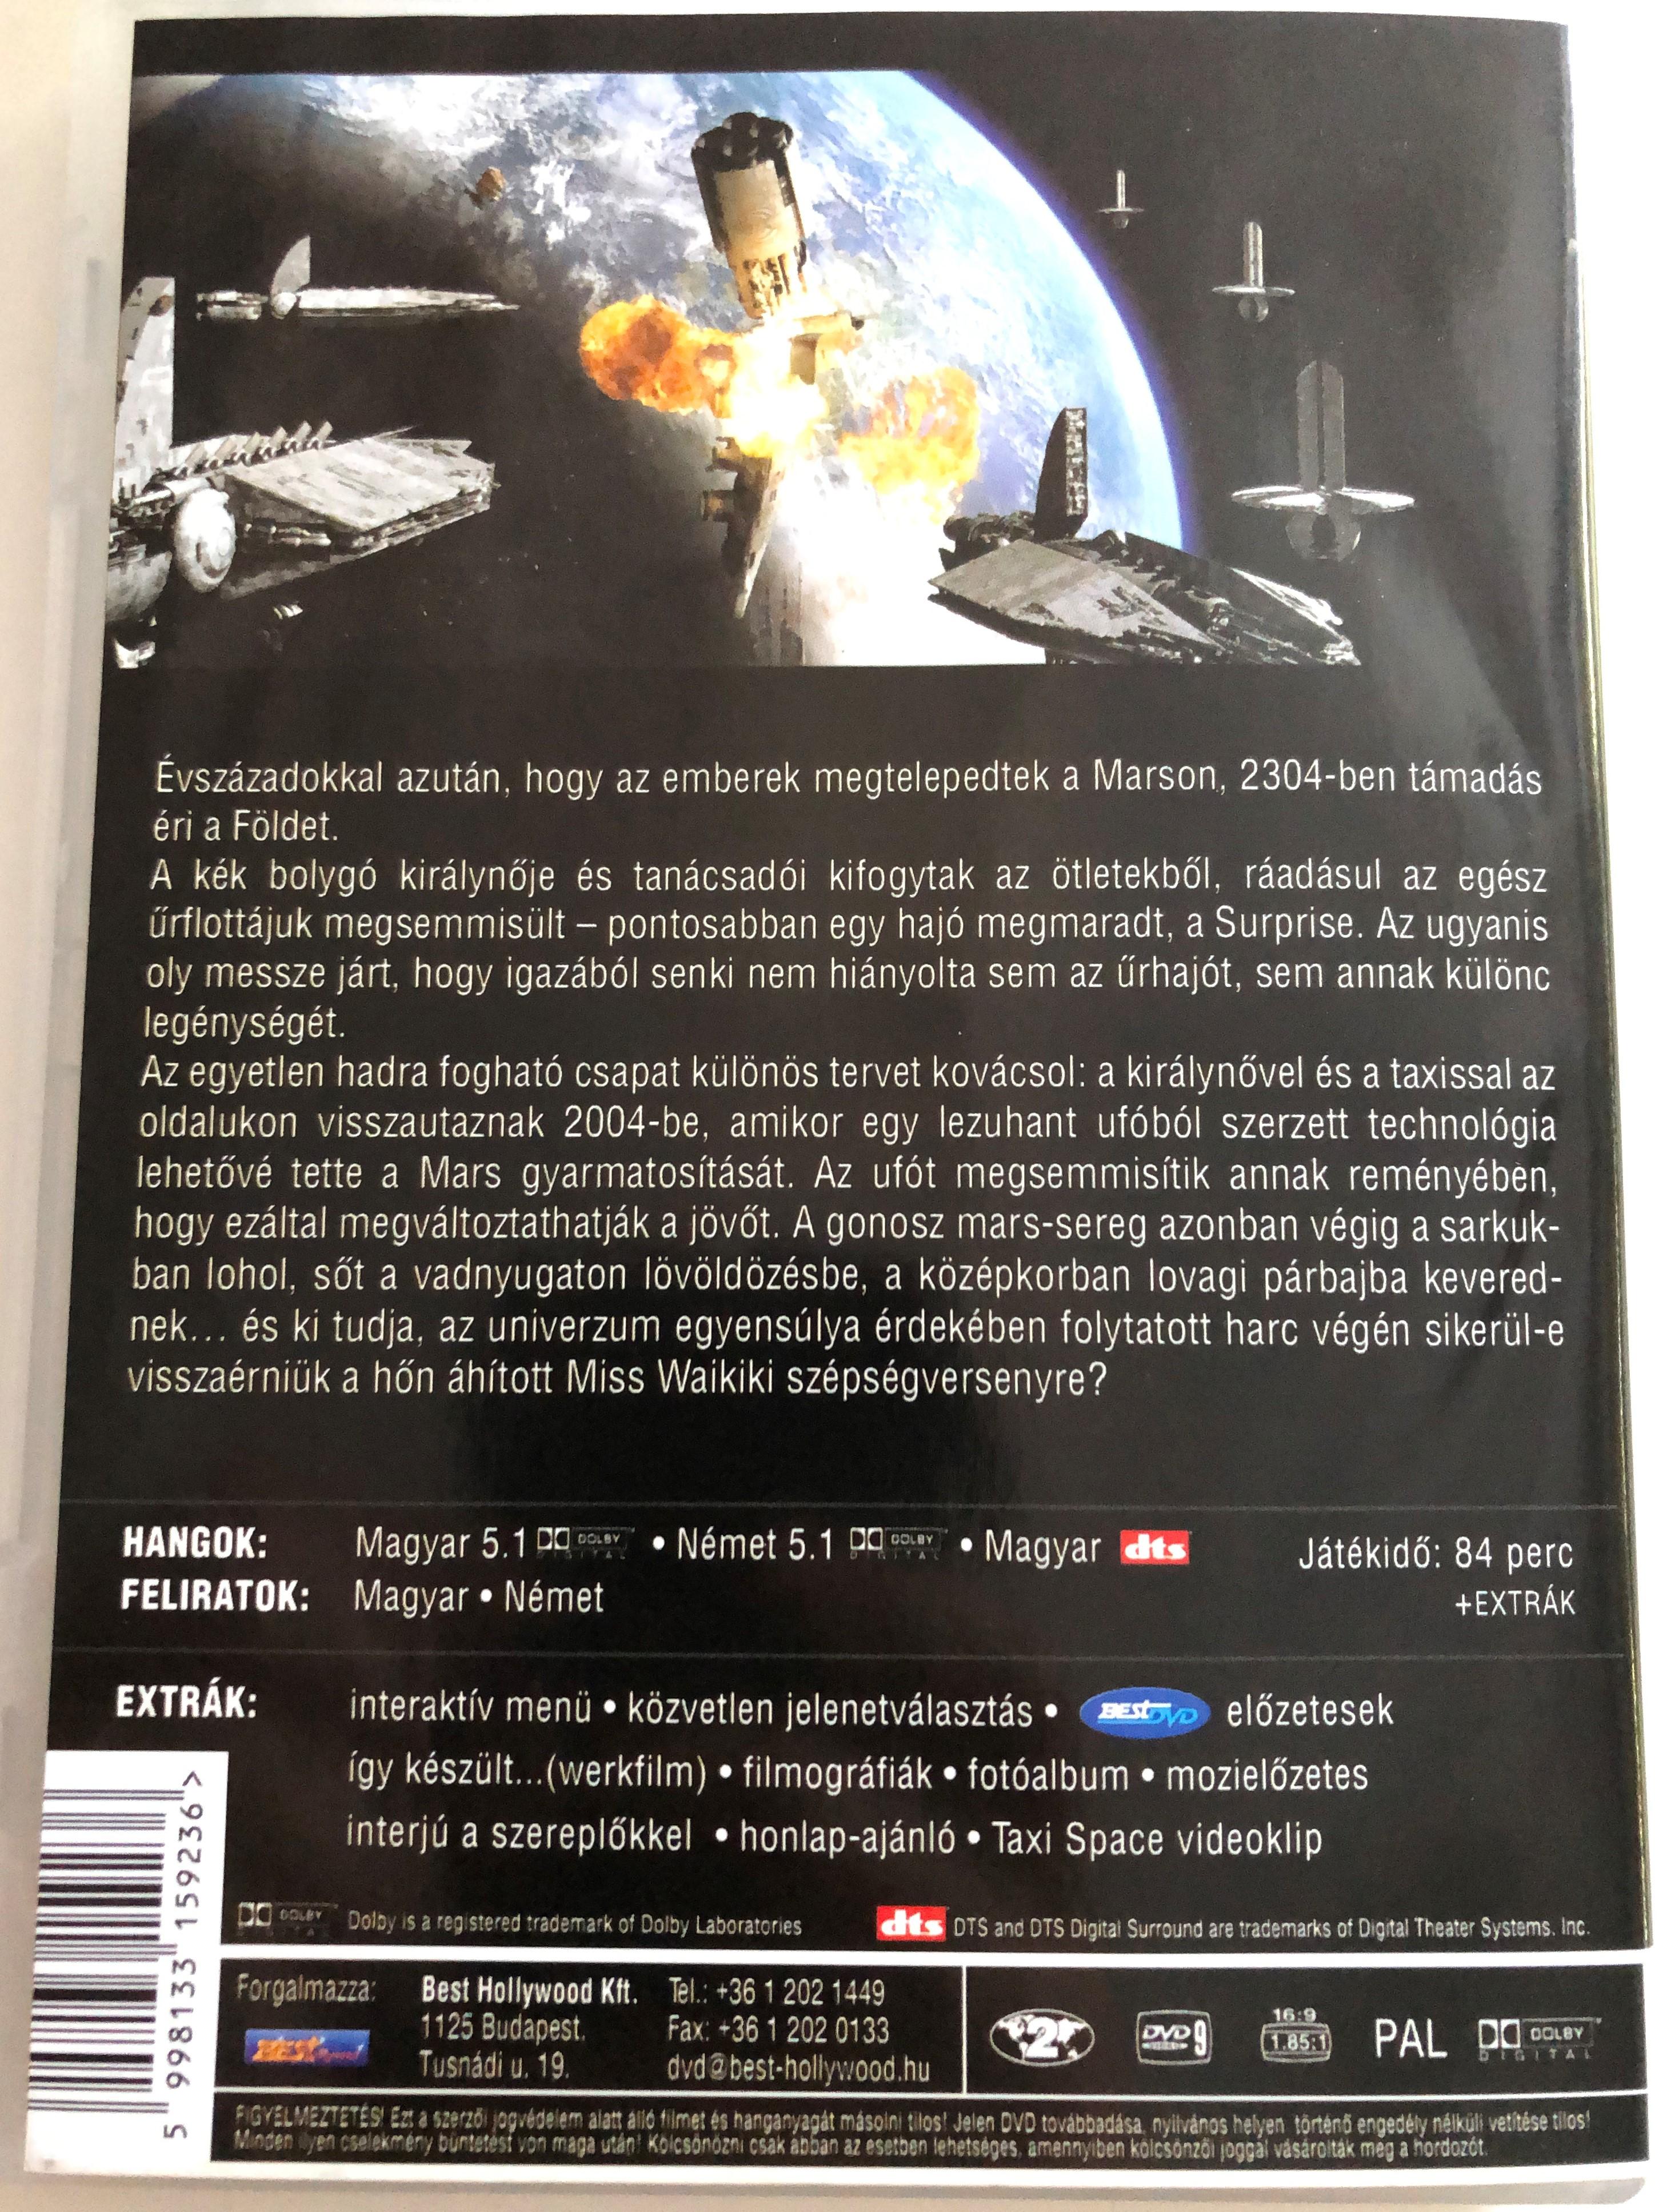 -t-raumschiff-surprise-periode-1-dvd-2004-a-z-rhaj-directed-by-michael-herbig-starring-michael-herbig-rick-kavanian-christian-tramitz-anja-kling-2-.jpg